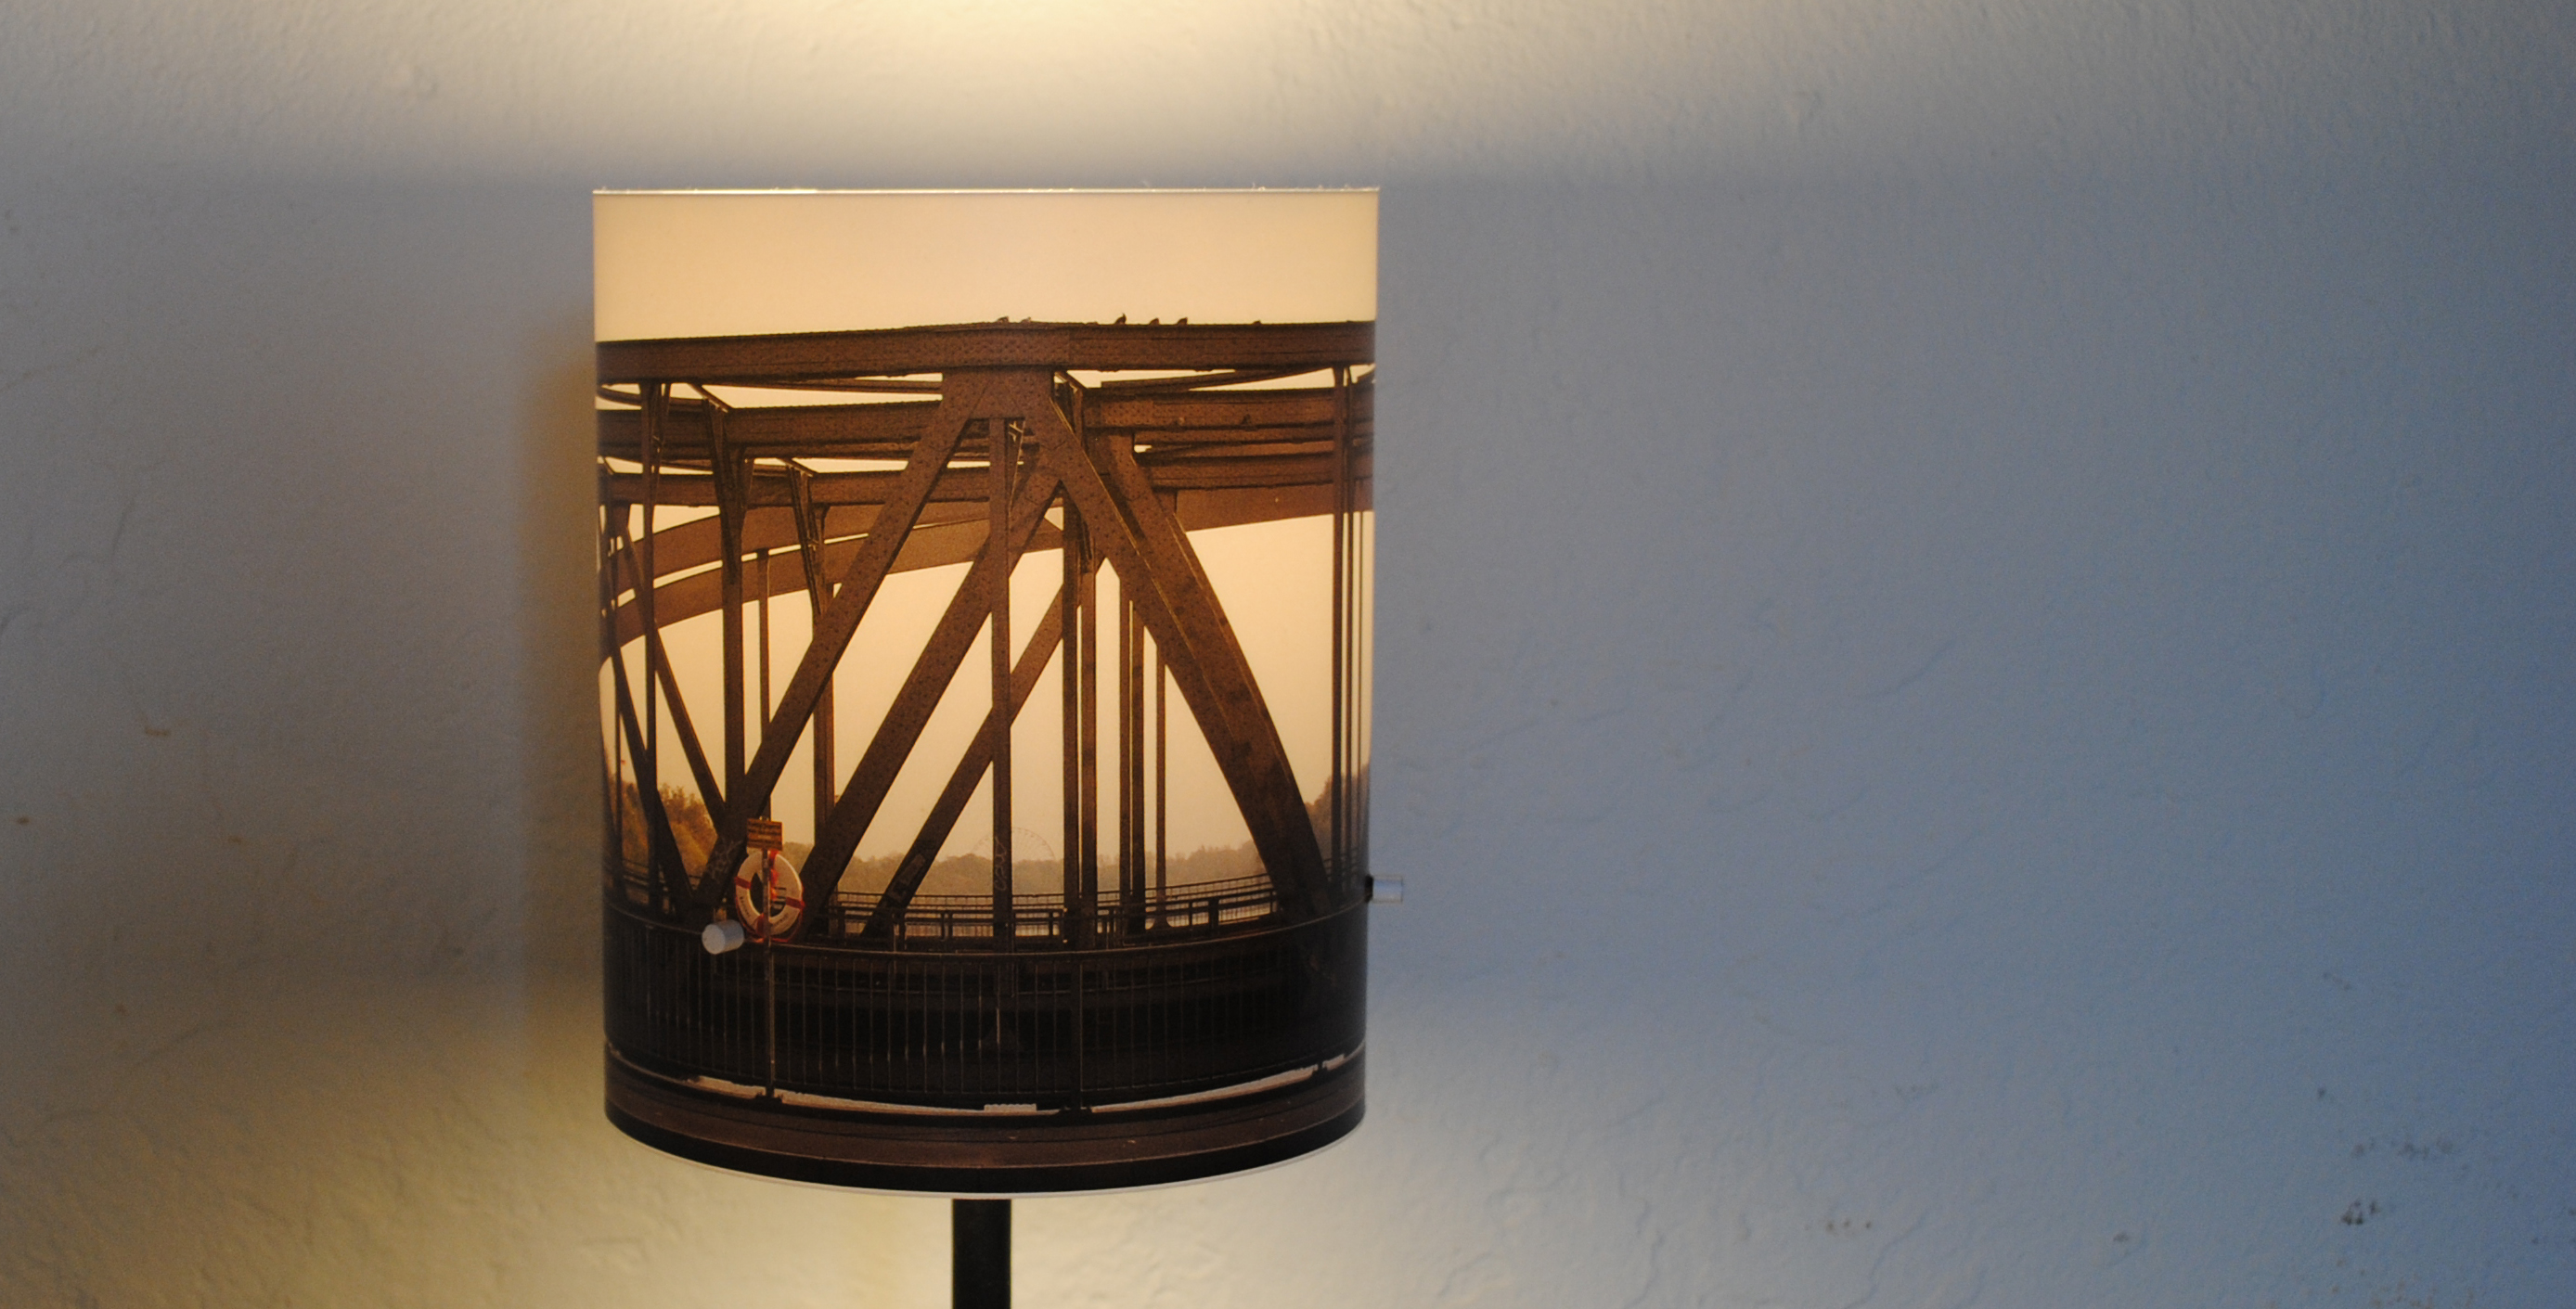 best fotolampe mit eigenem bild ideas. Black Bedroom Furniture Sets. Home Design Ideas